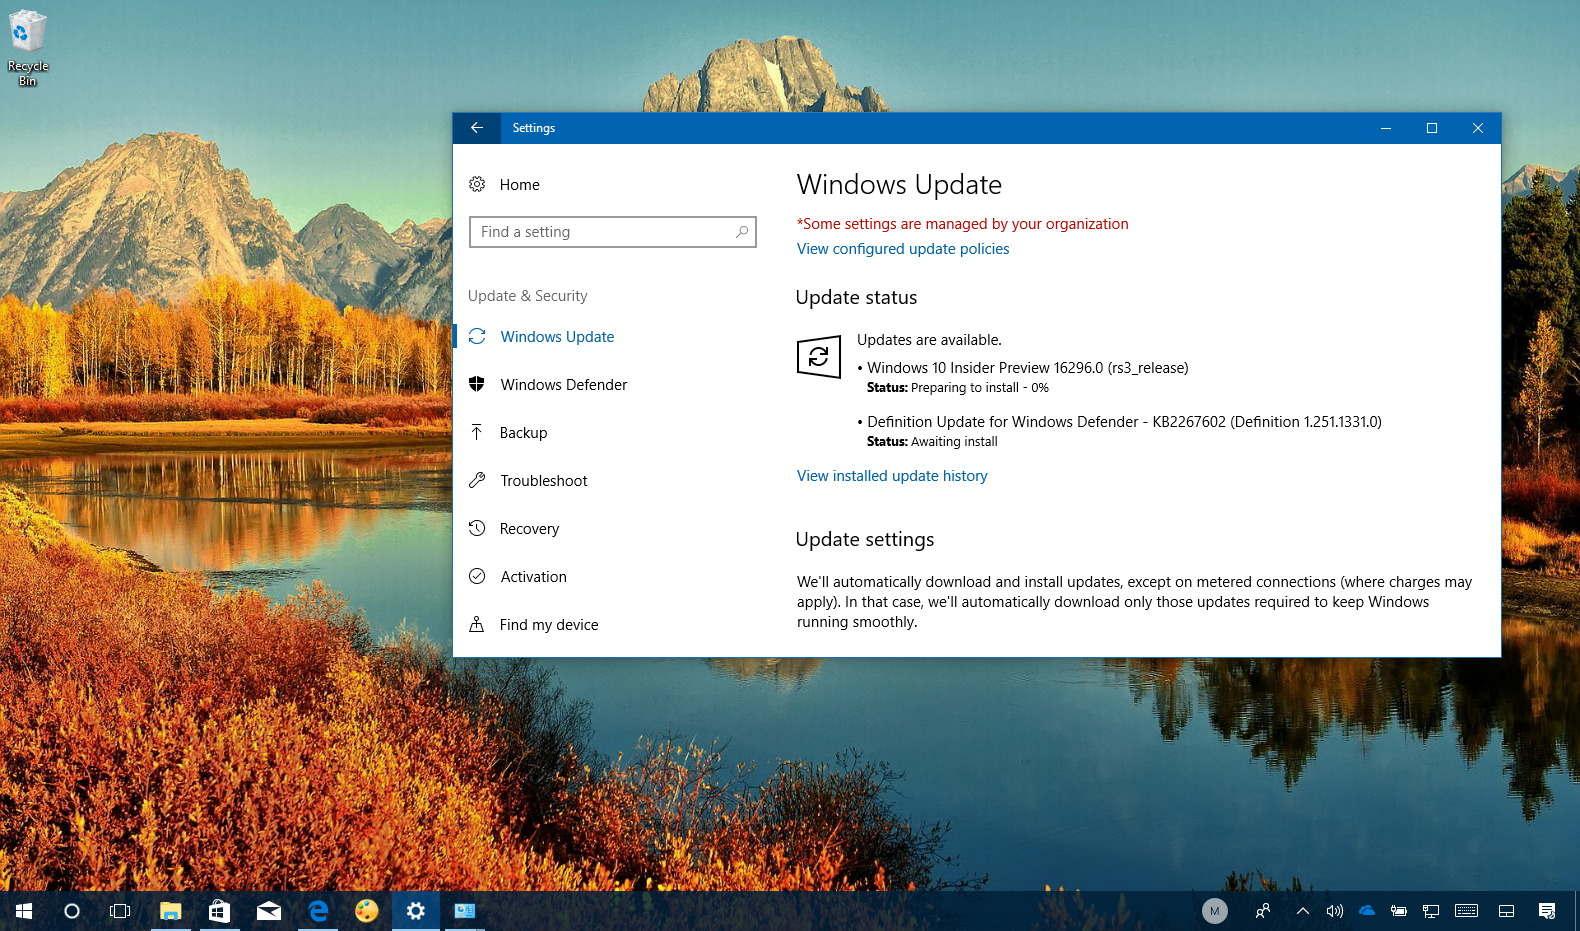 Windows 10 build 16296